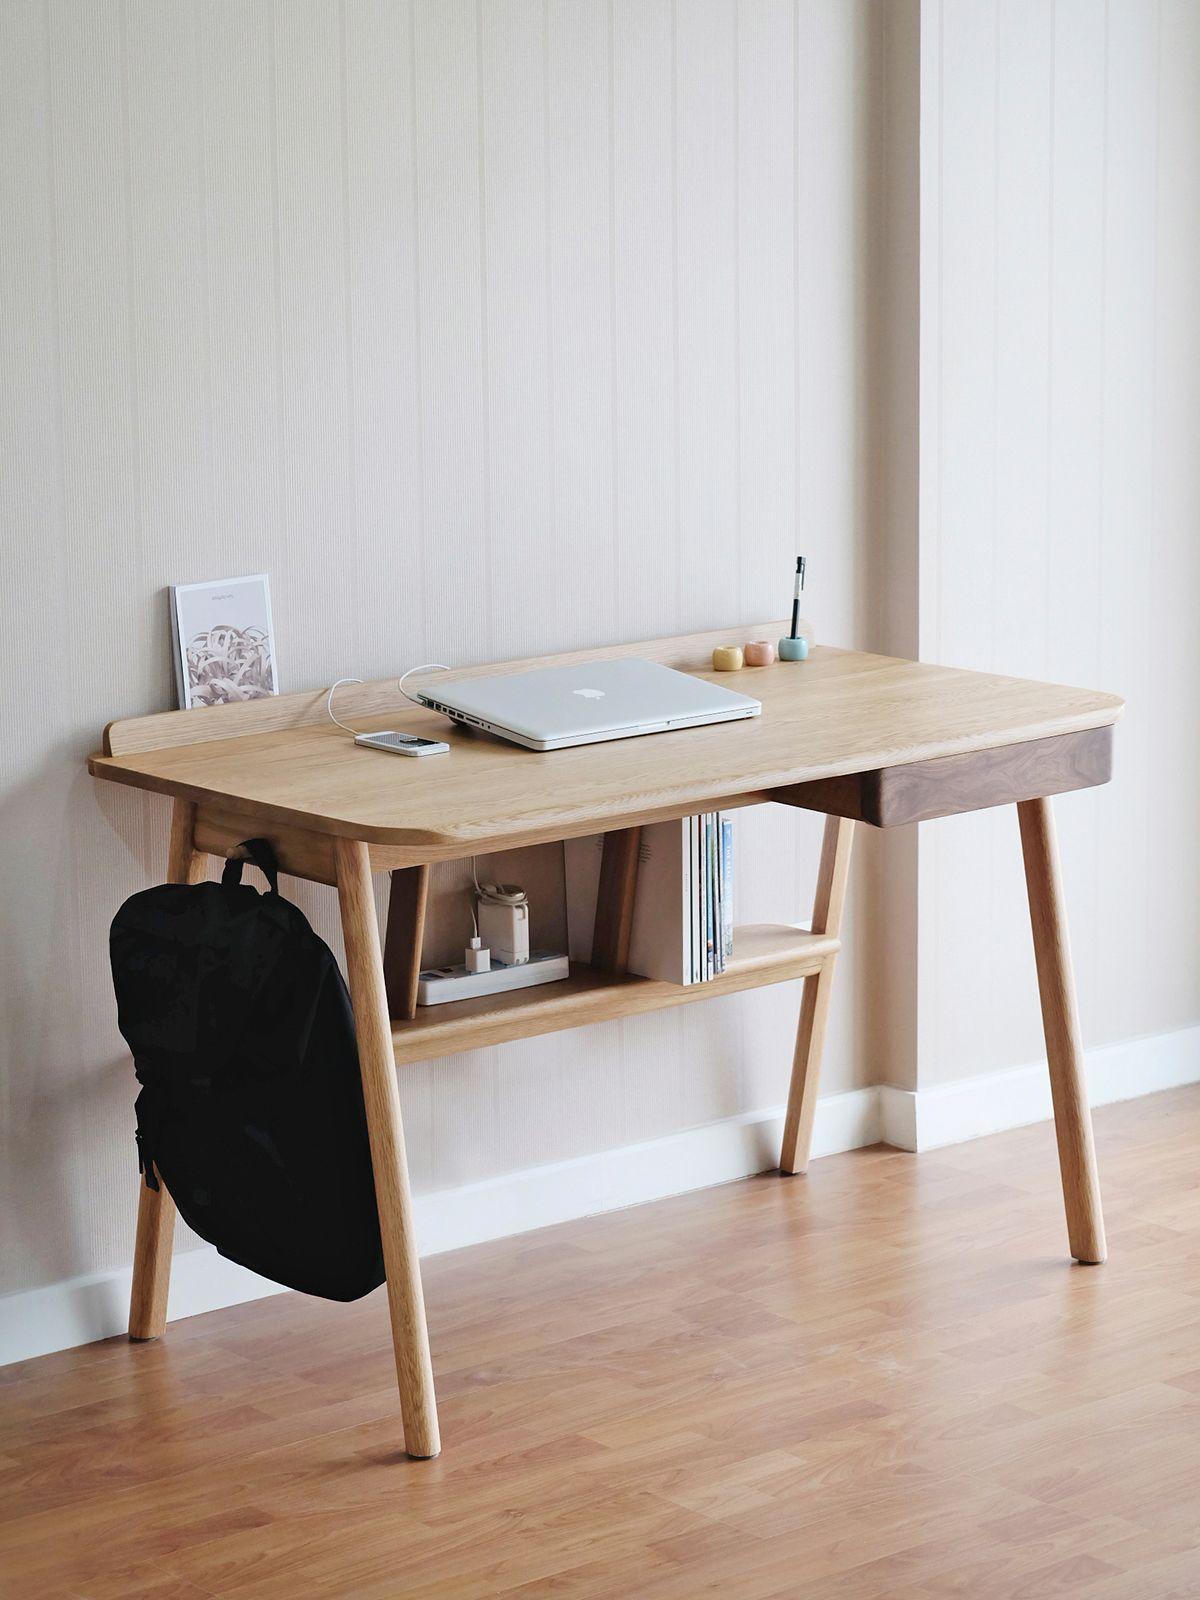 Plywood Desk Design : plywood, design, Creative, Office, Urban, Living., Designed, KILTT, Designs,, Design,, Decor